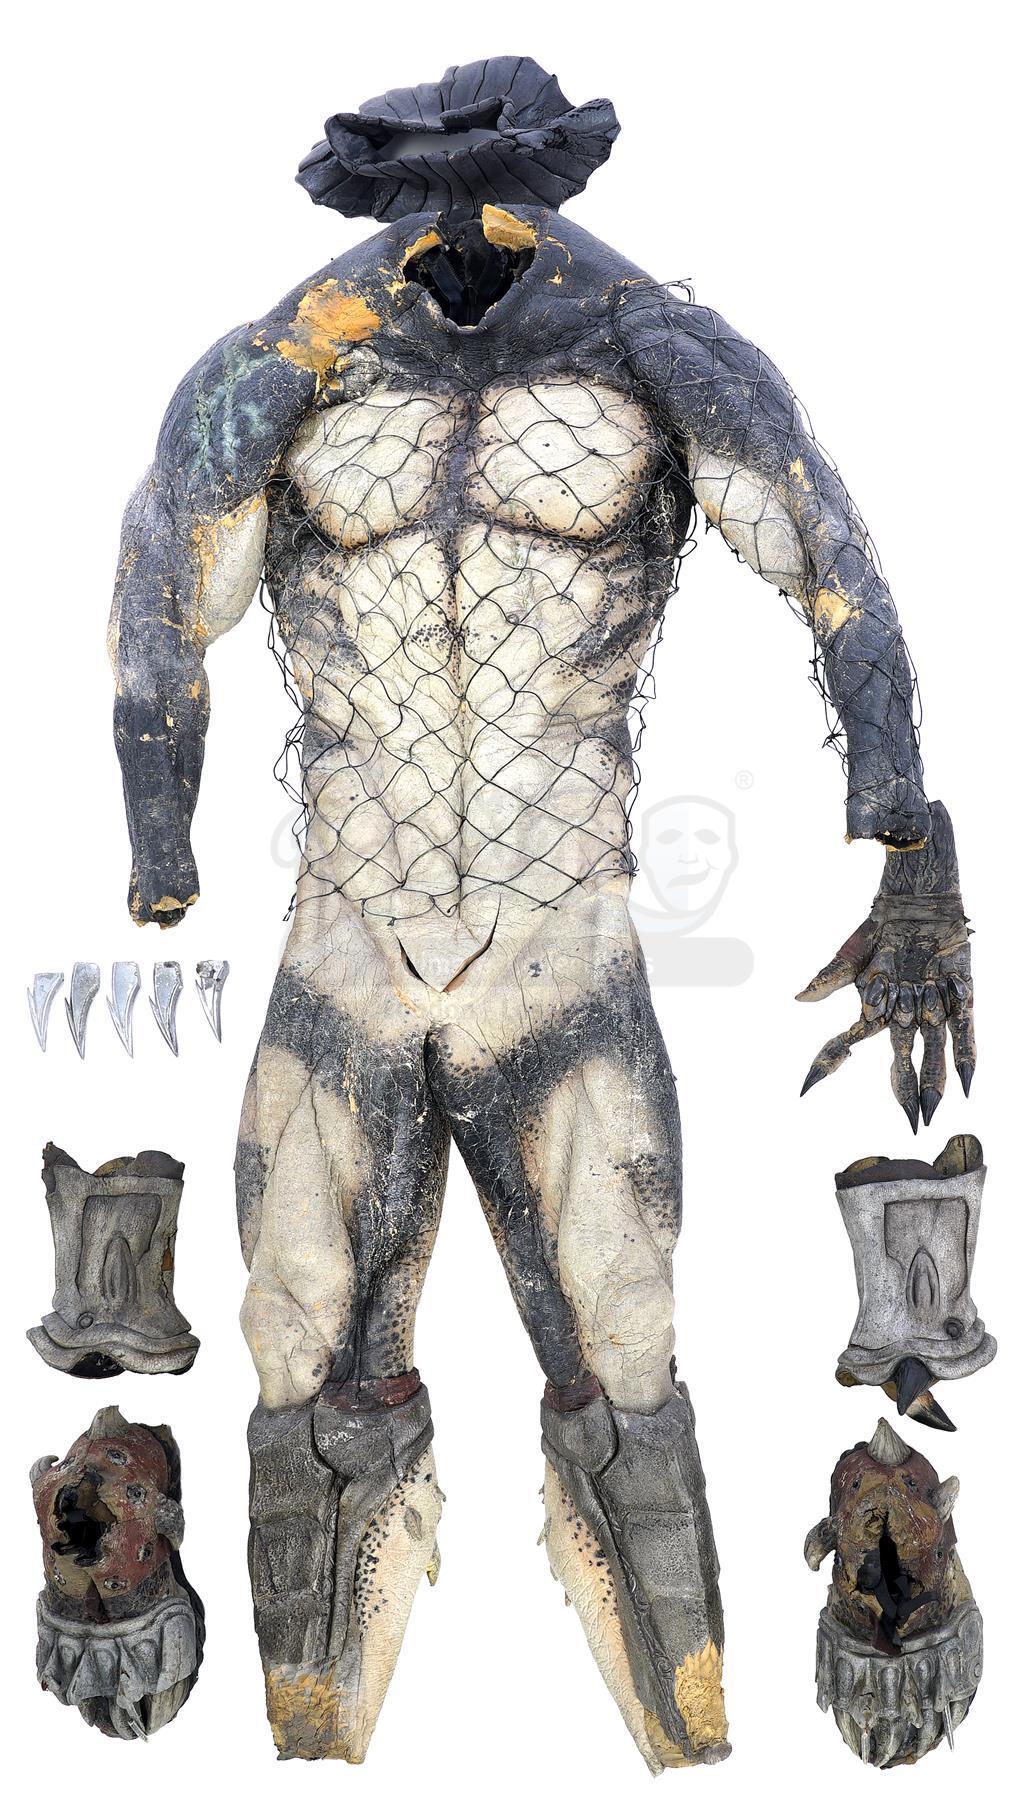 Lot # 19: AVPR: Aliens vs Predator - Requiem - Wolf (Ian Whyte) Predator Costume Components